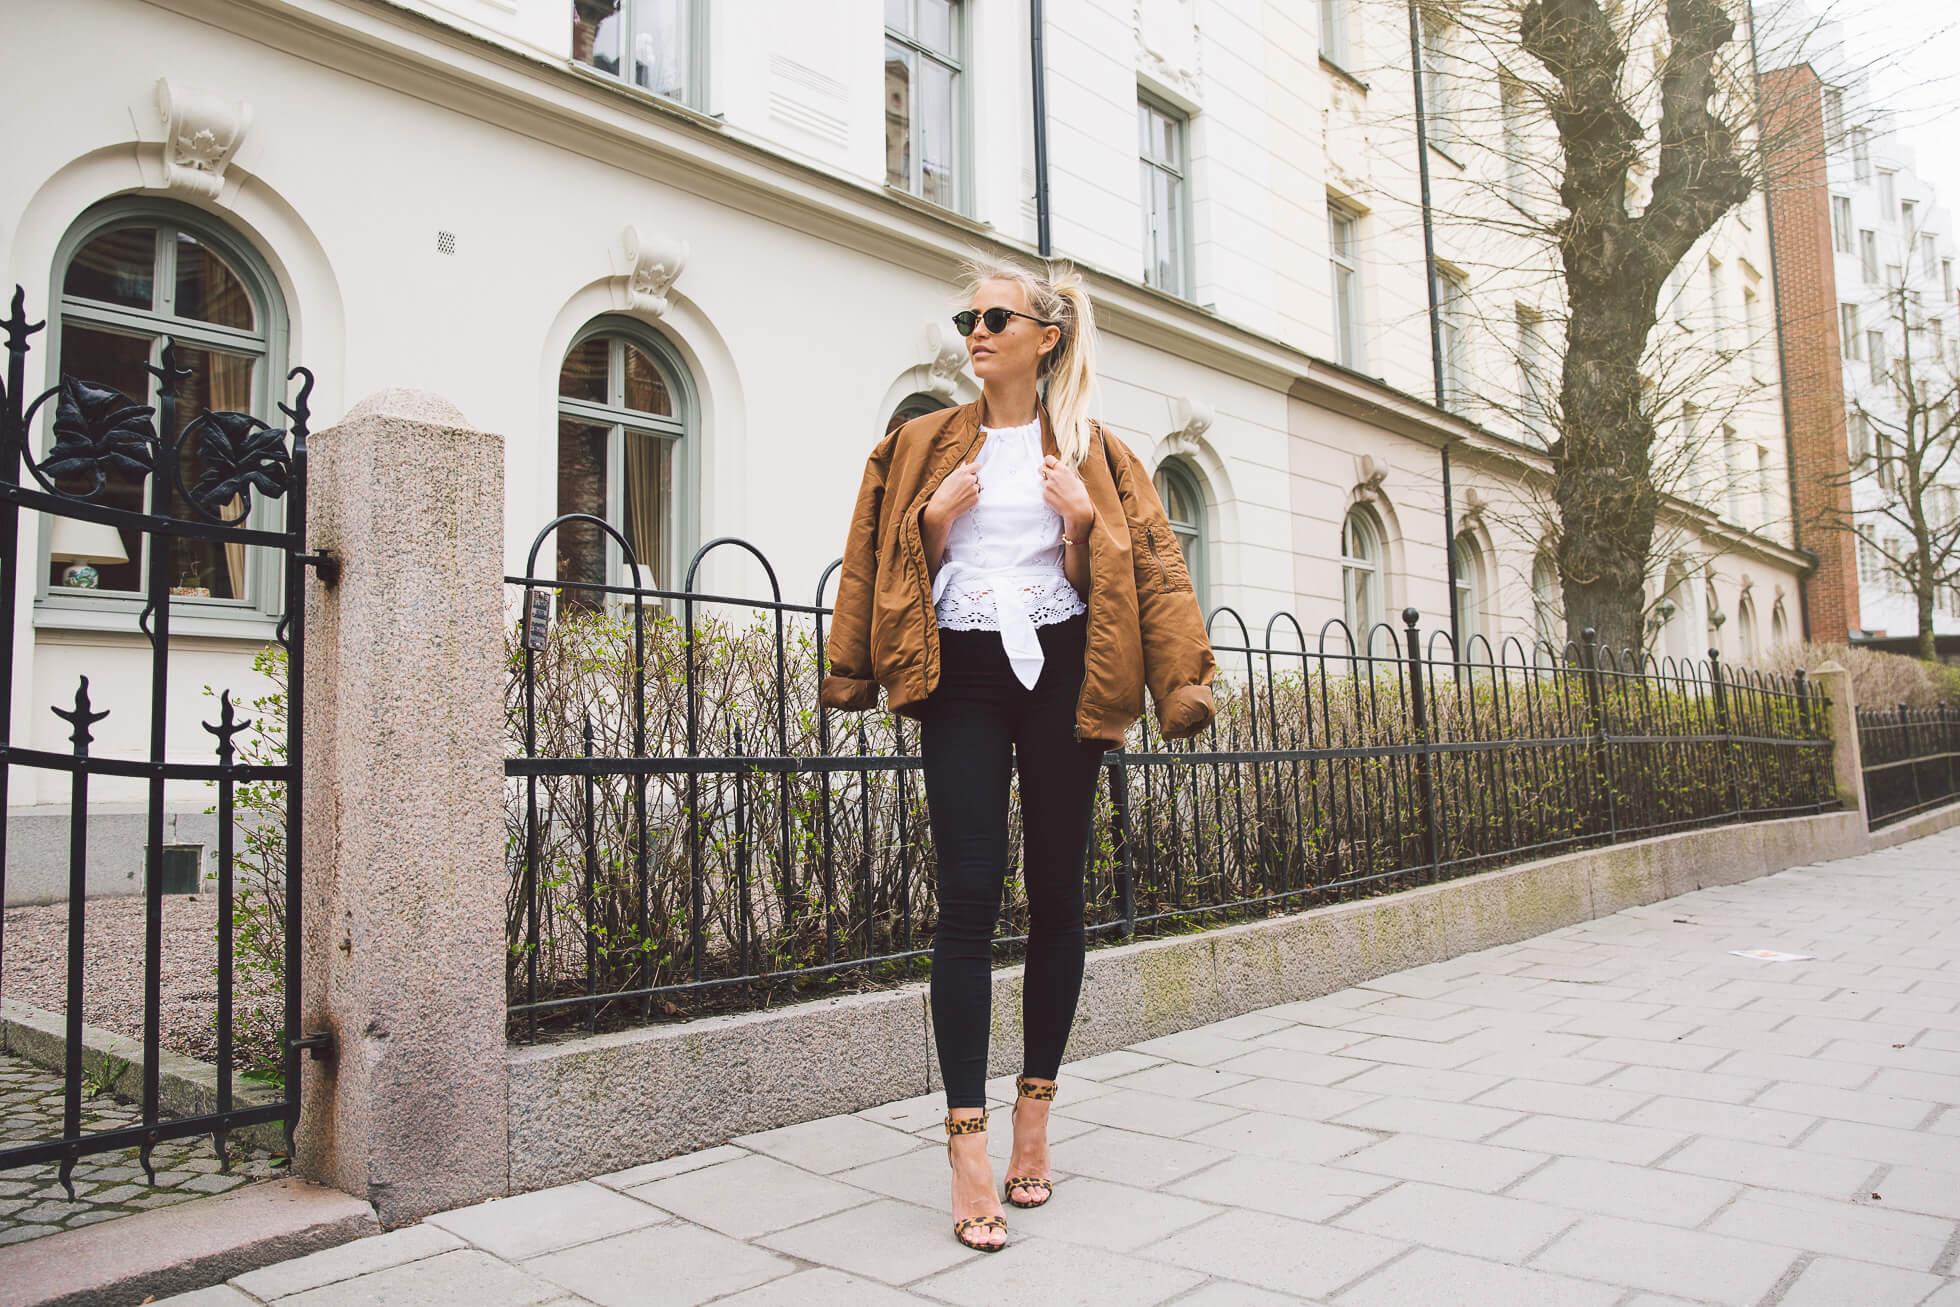 janni-deler-loveeyewear-rayban8S0A8459-Redigera